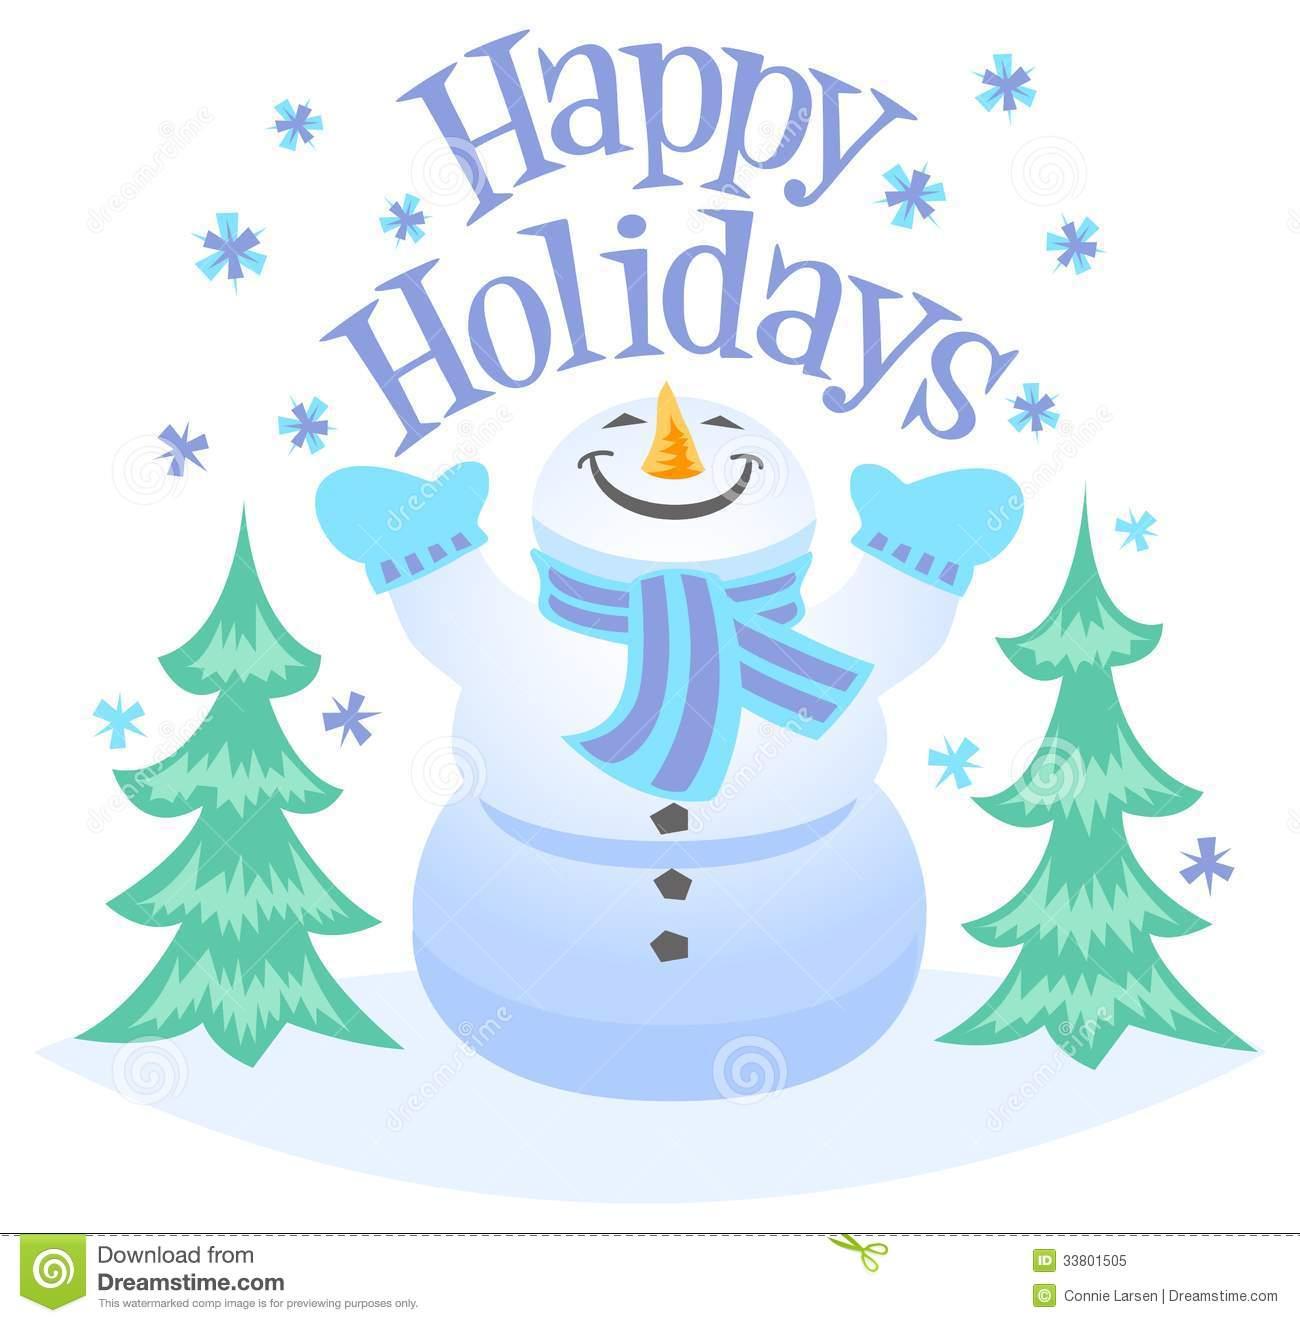 Happy Holidays Snowman Clipart .-Happy Holidays Snowman Clipart .-12